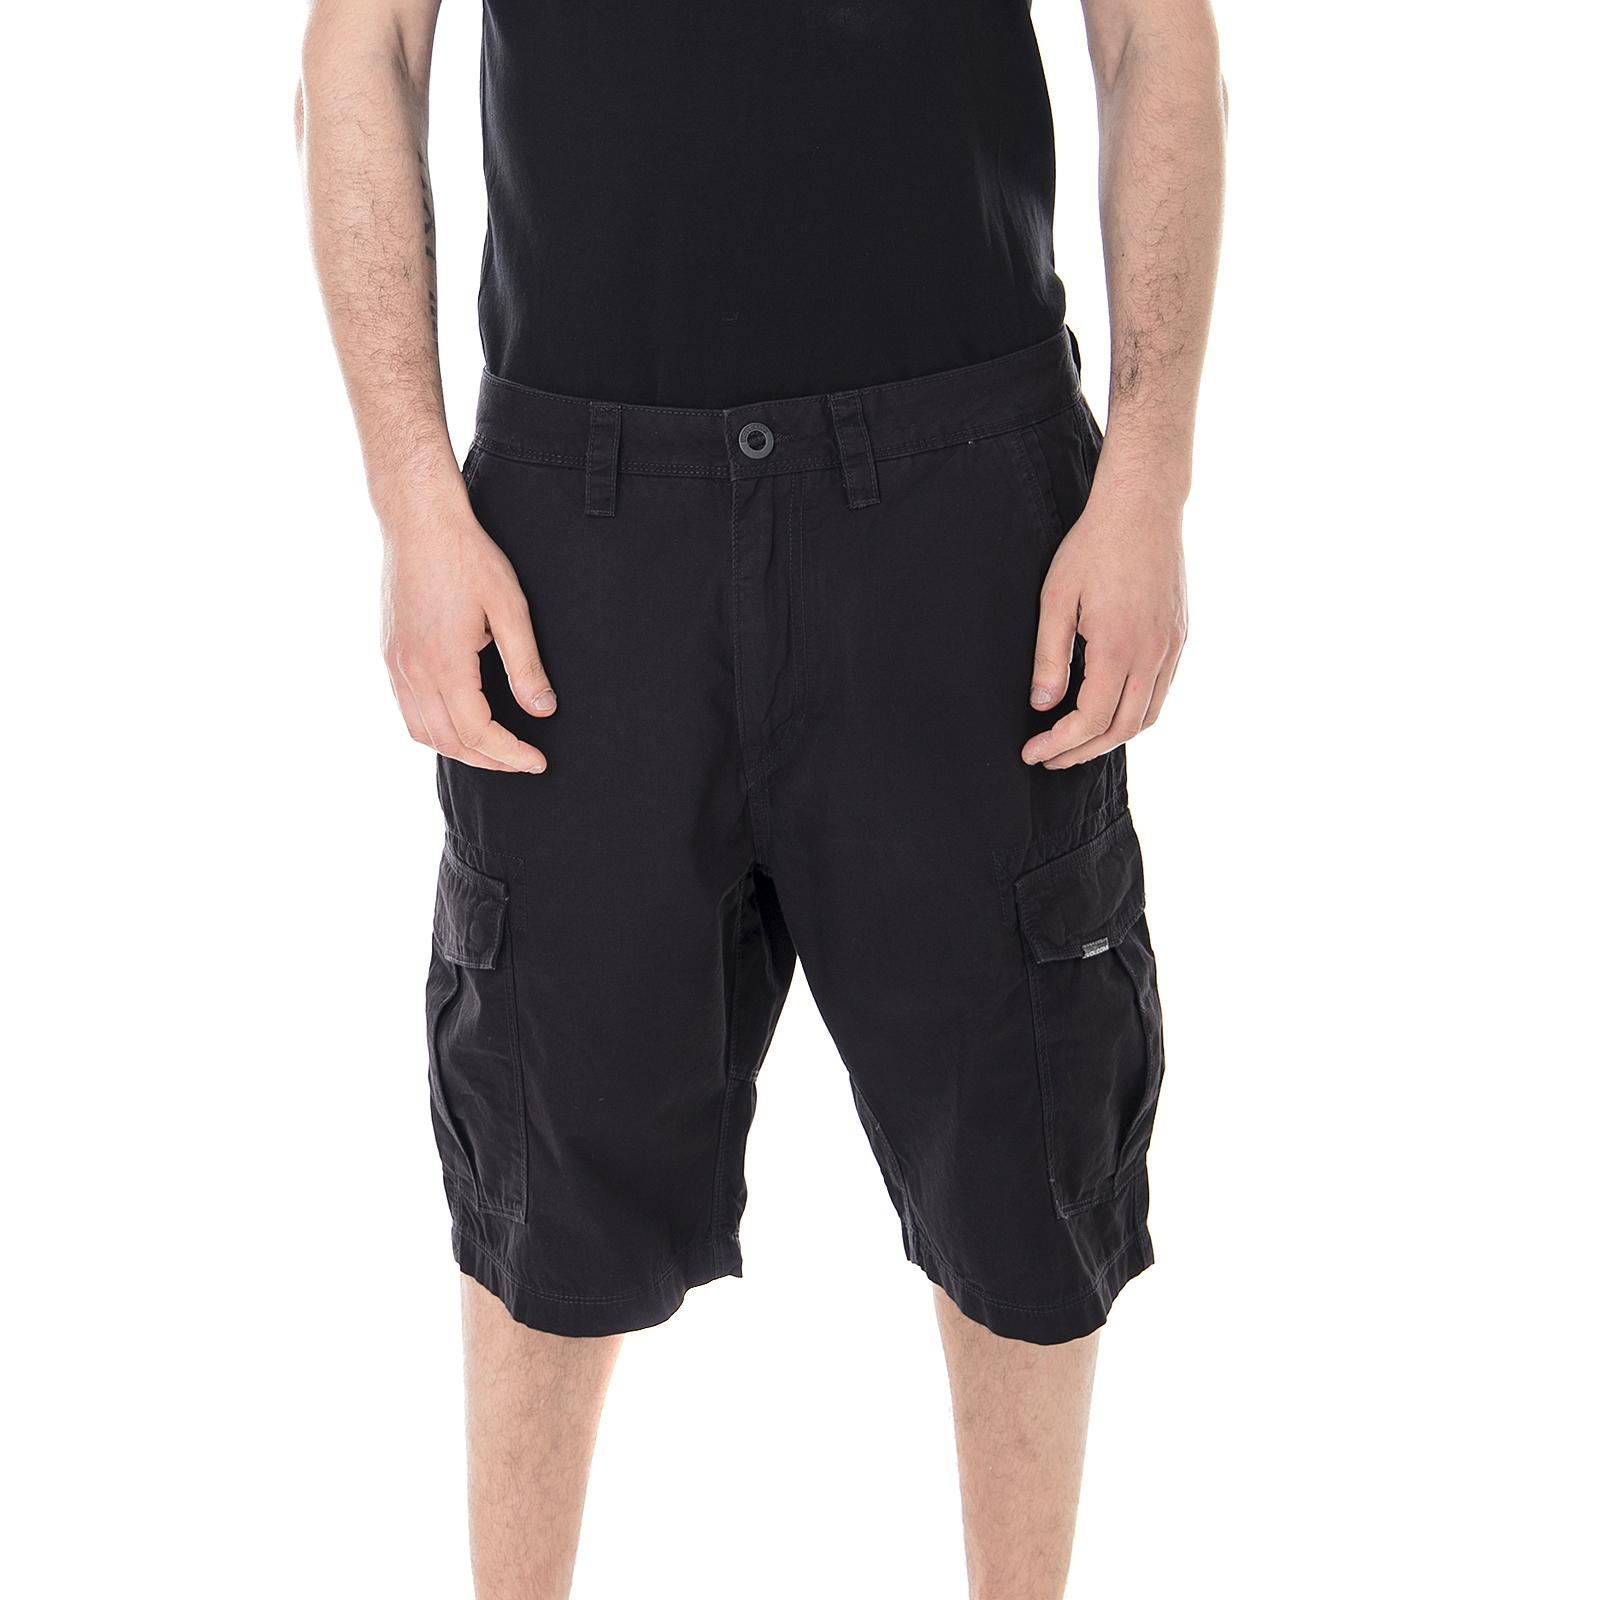 Volcom-Shorts-Miter-Ii-Cargo-Short-Black-Nero